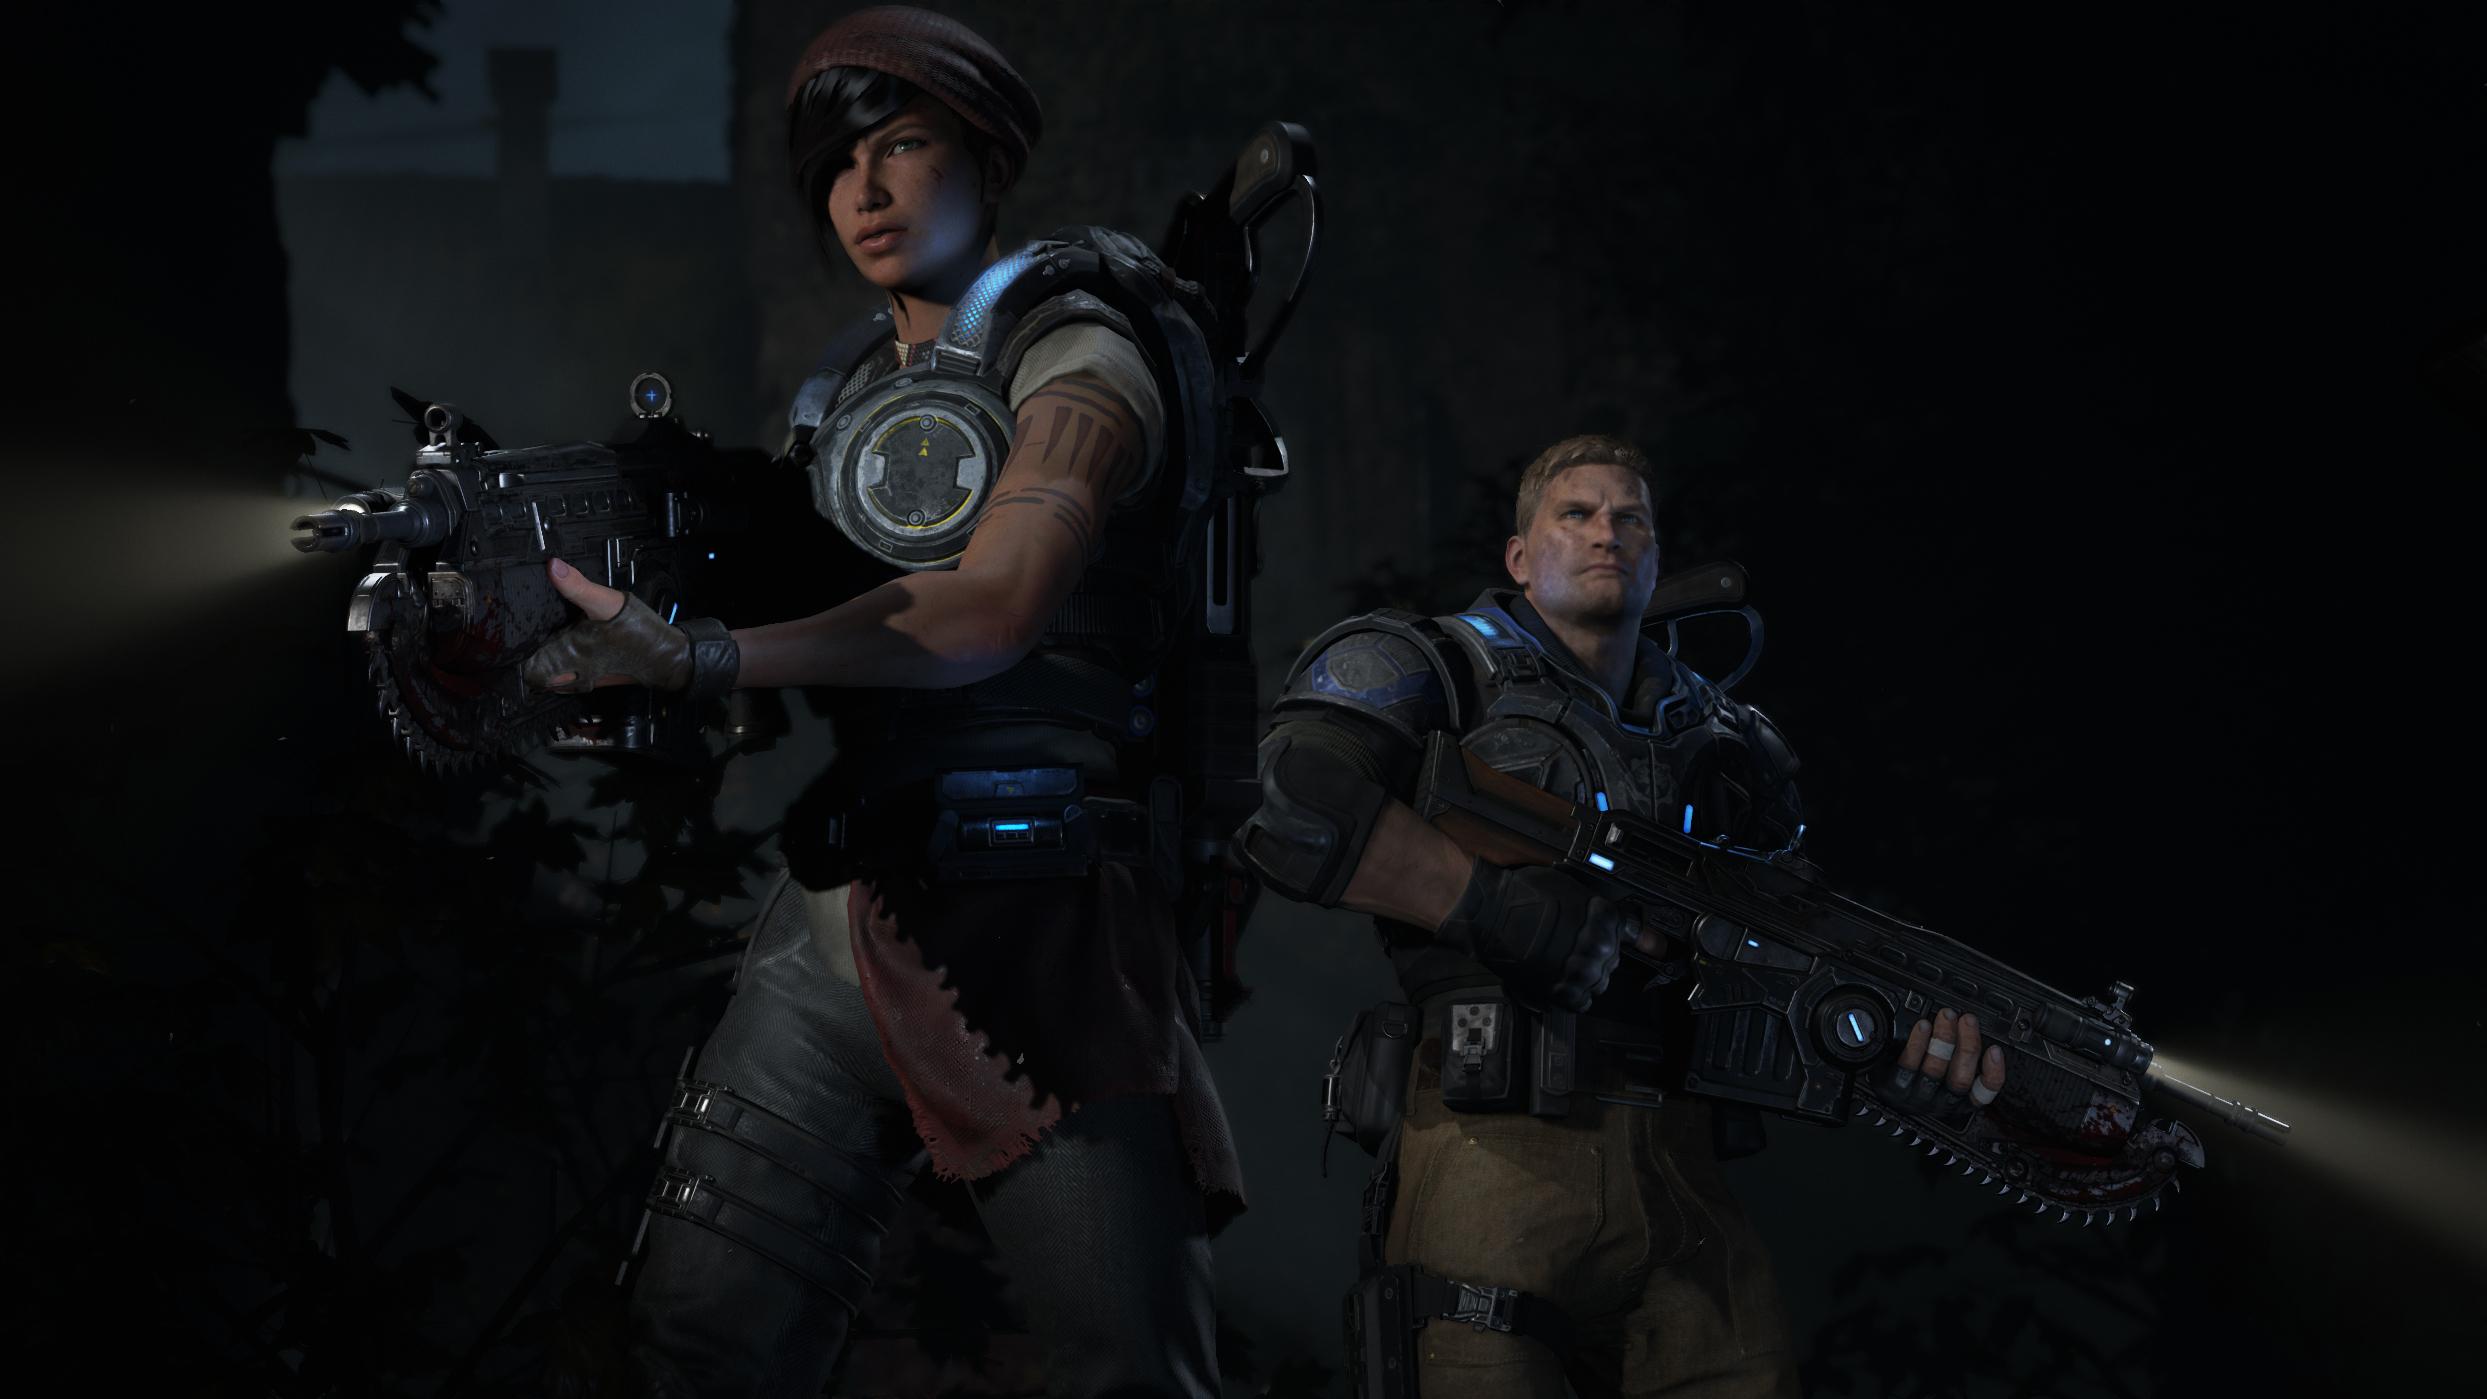 Gears 4 E3 2015 Screenshots Have Arrived